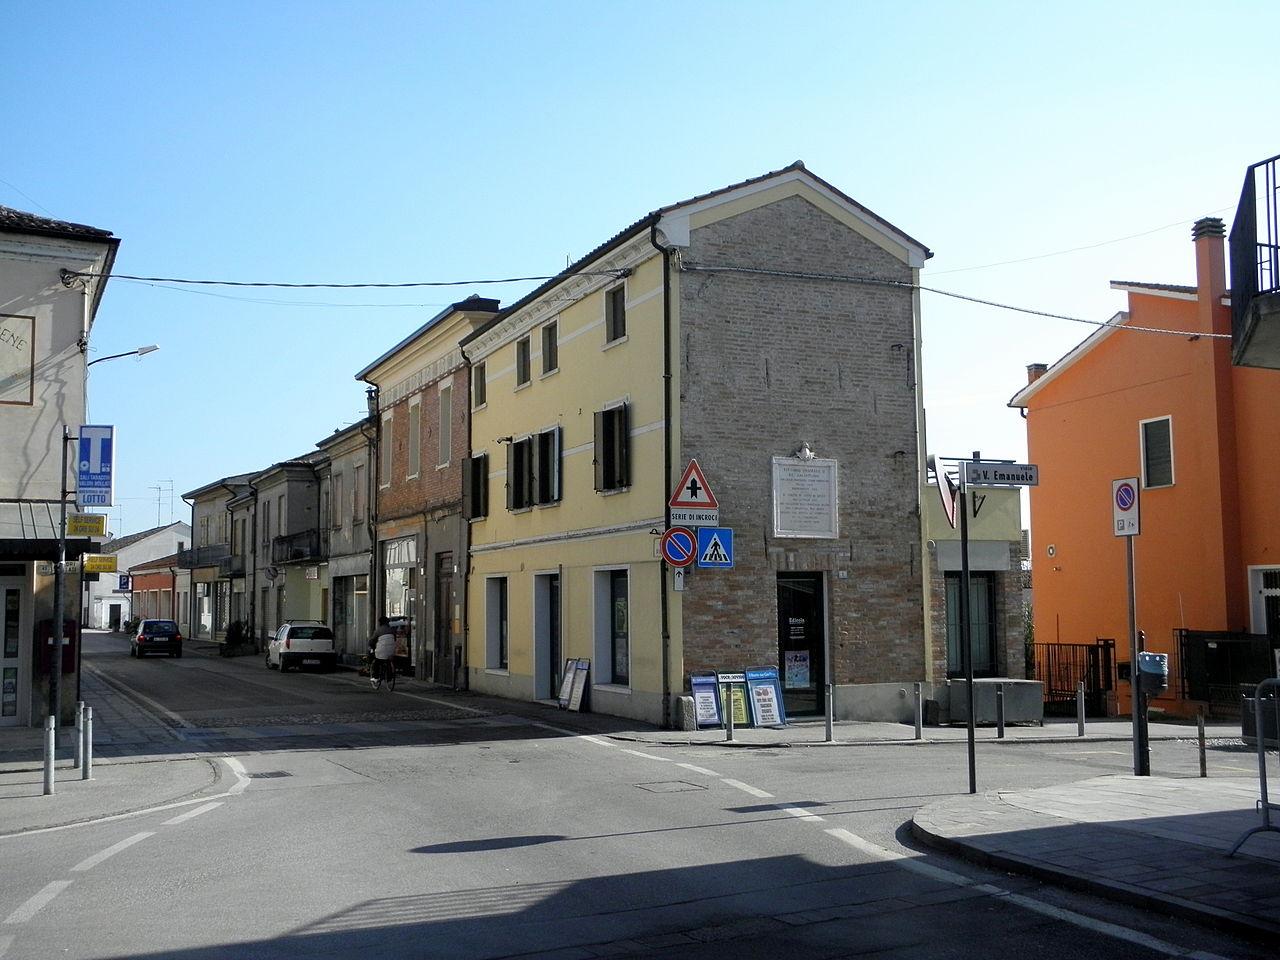 File:Via Dante Alighieri (Costa di Rovigo).JPG - Wikimedia ...